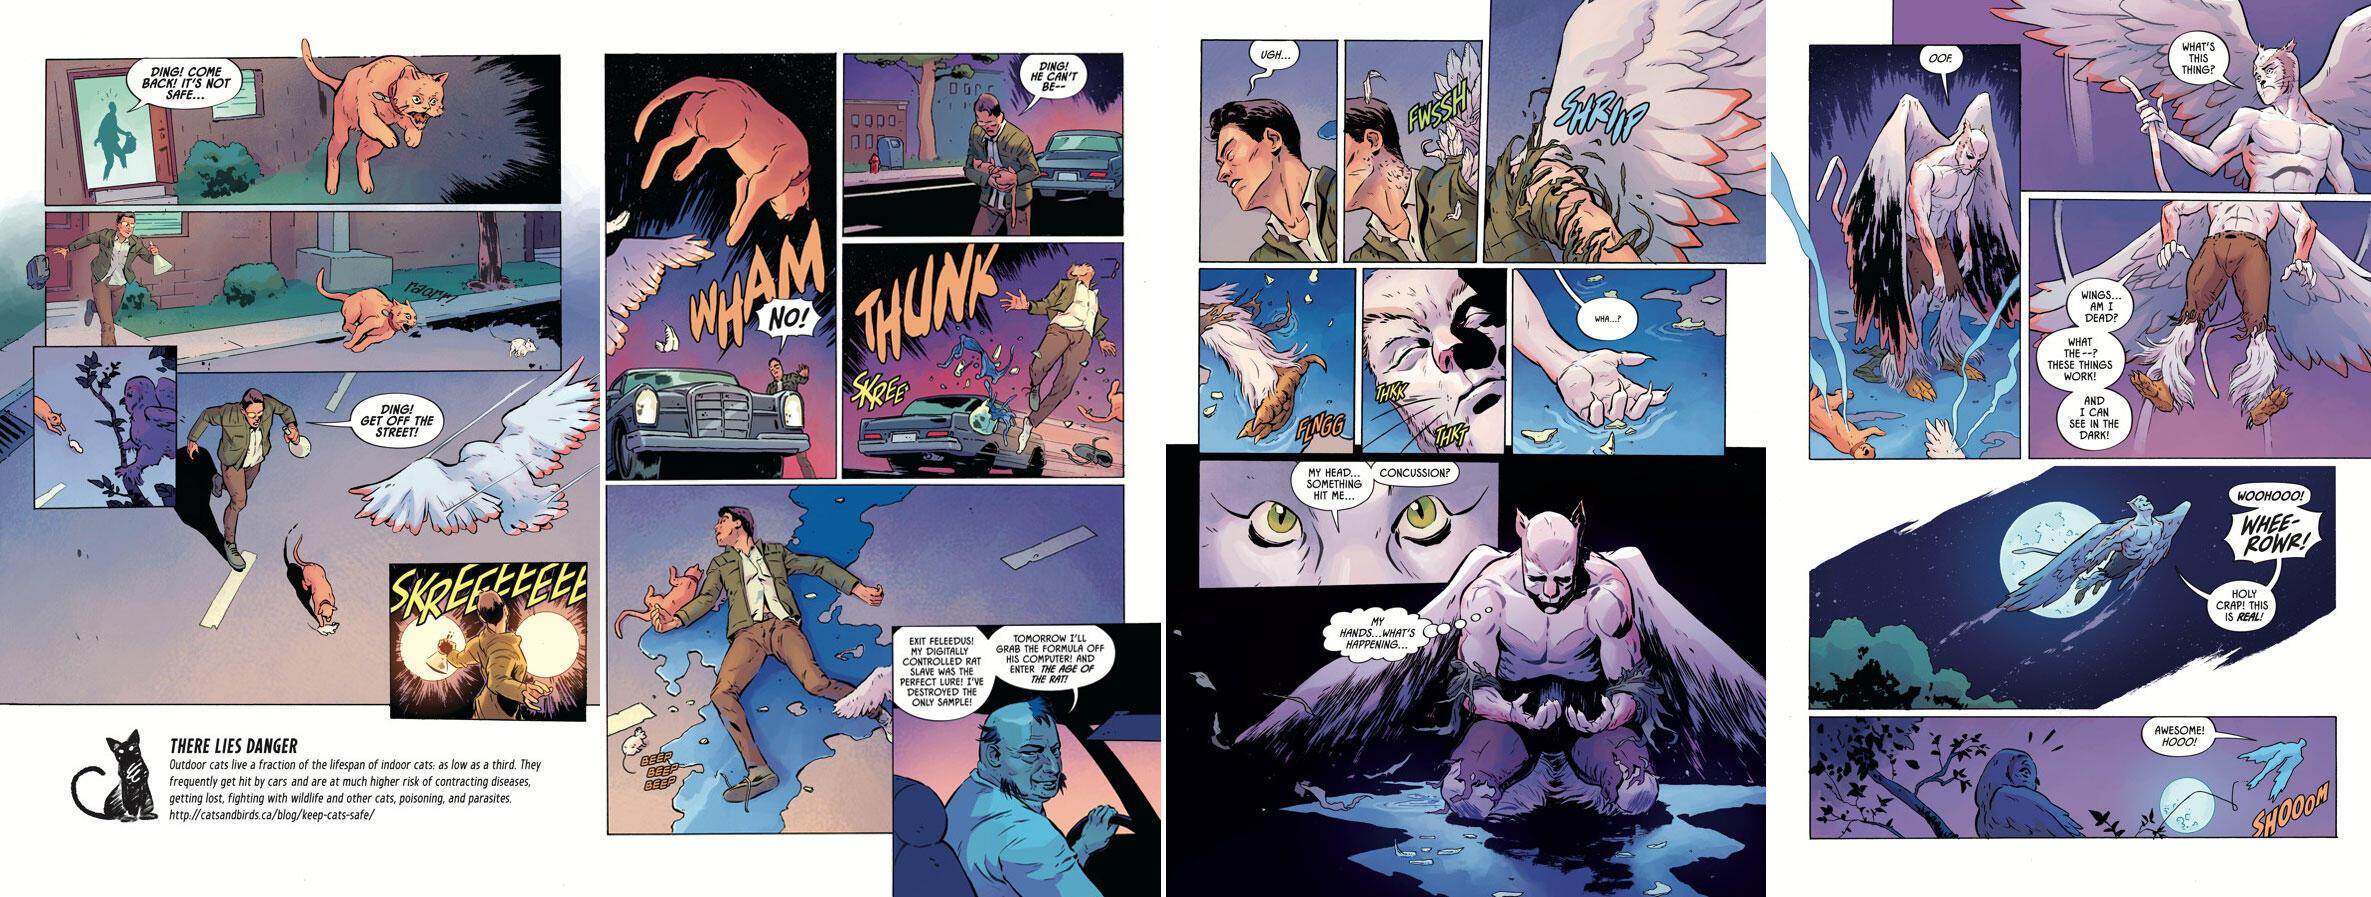 Illustrations: Courtesy of Dark Horse Comics